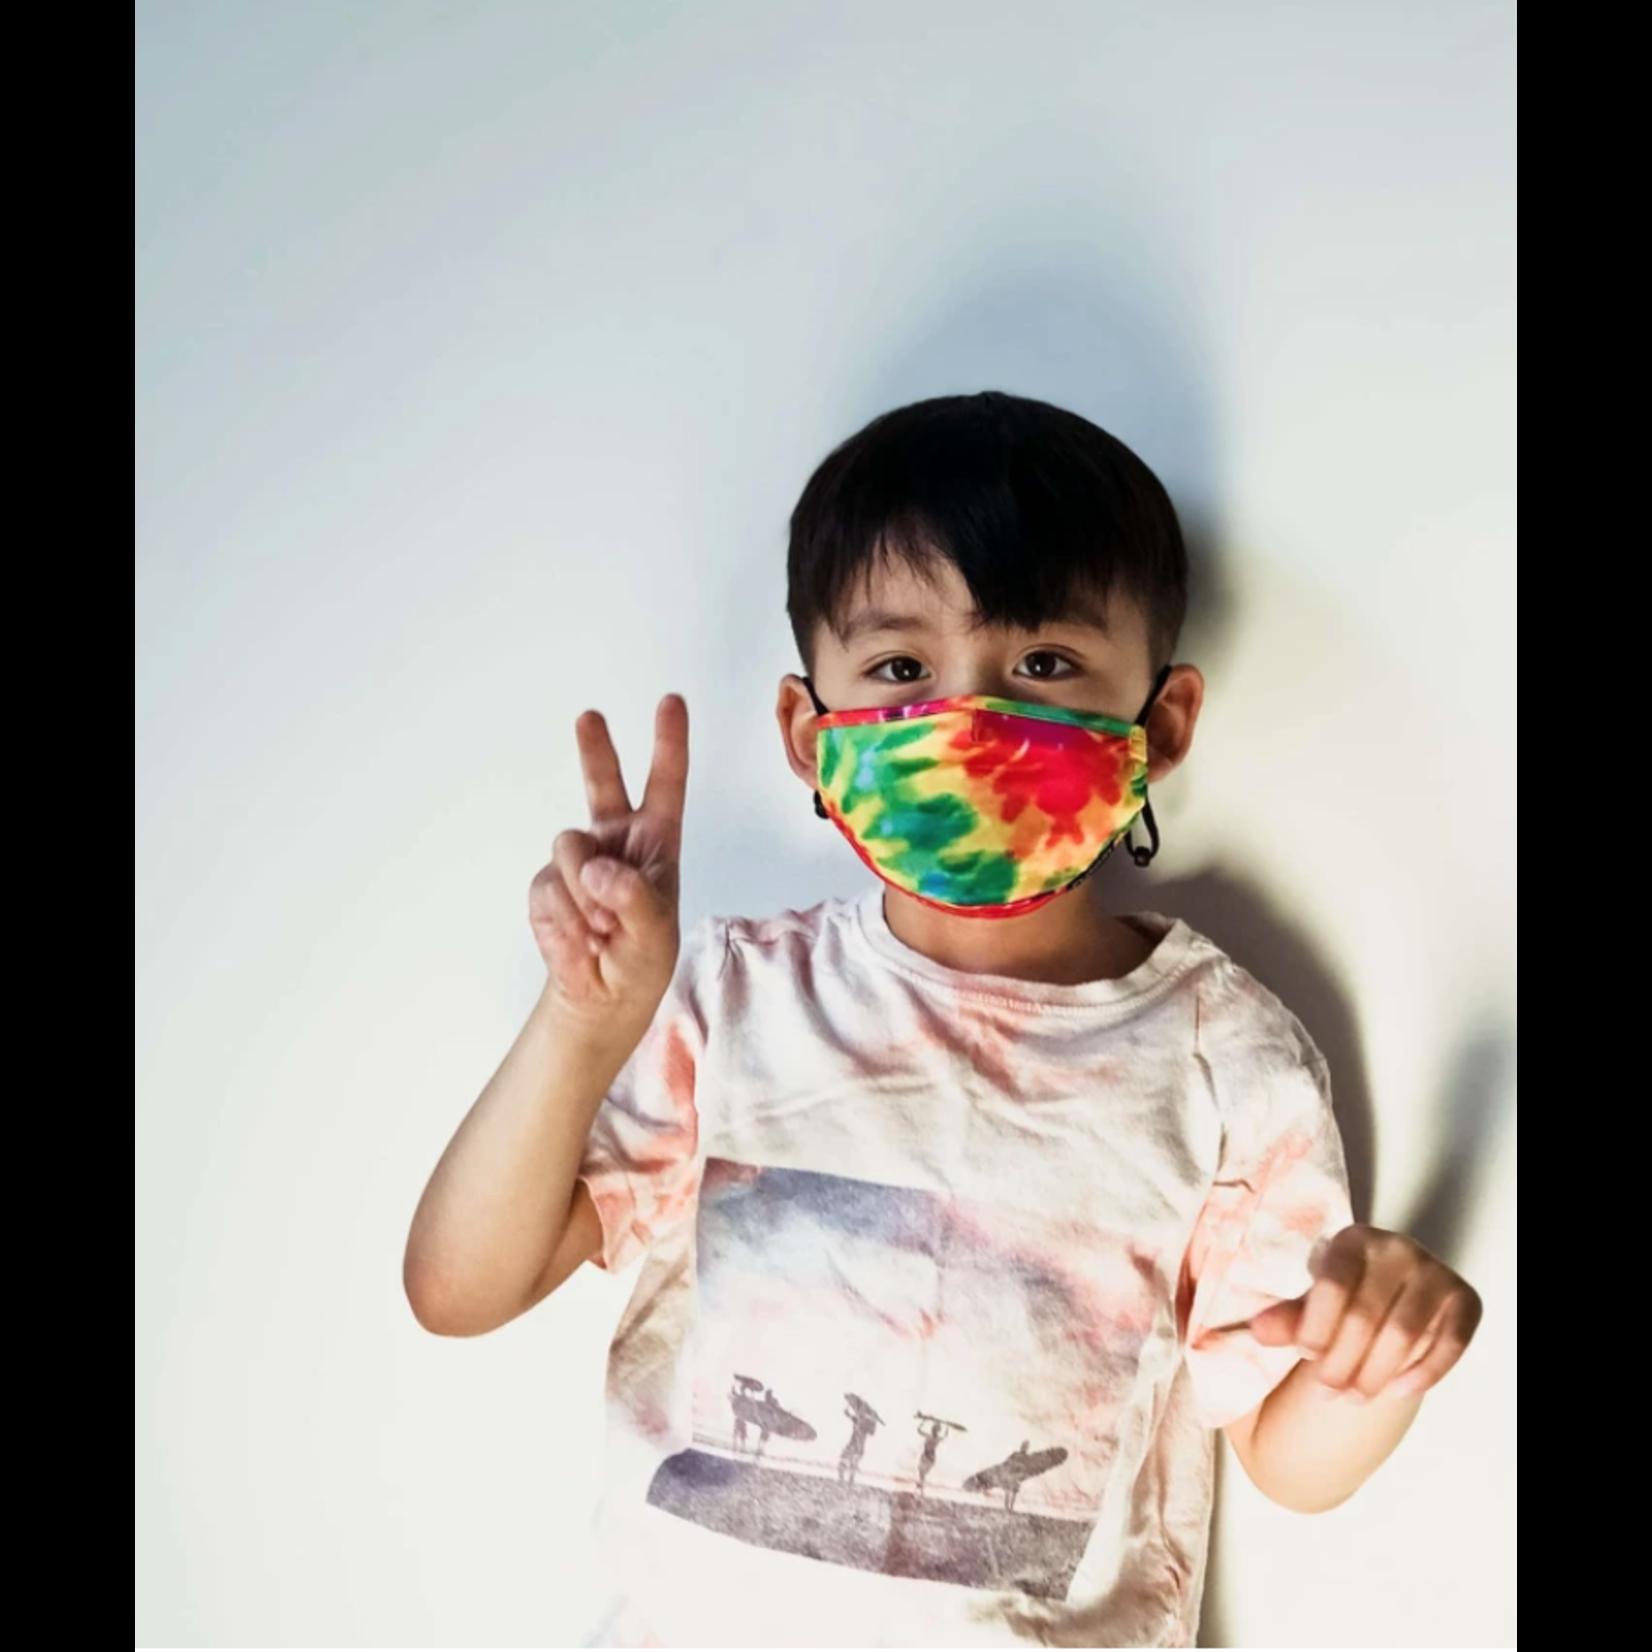 FYDELITY FYDELITY Face Mask Kids - Tie Dye